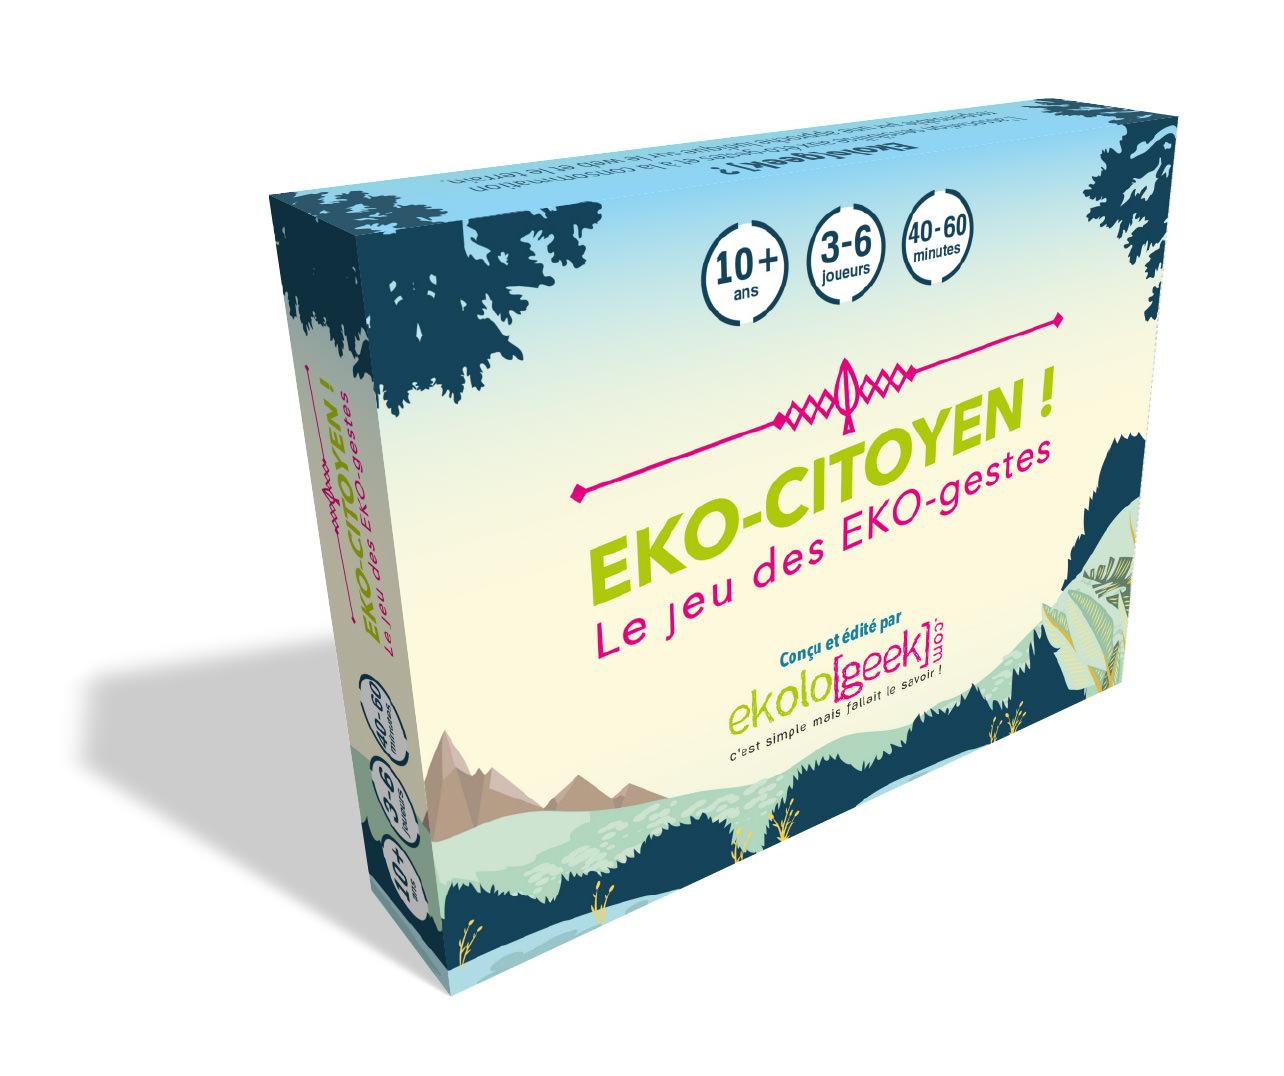 Eko-citoyen